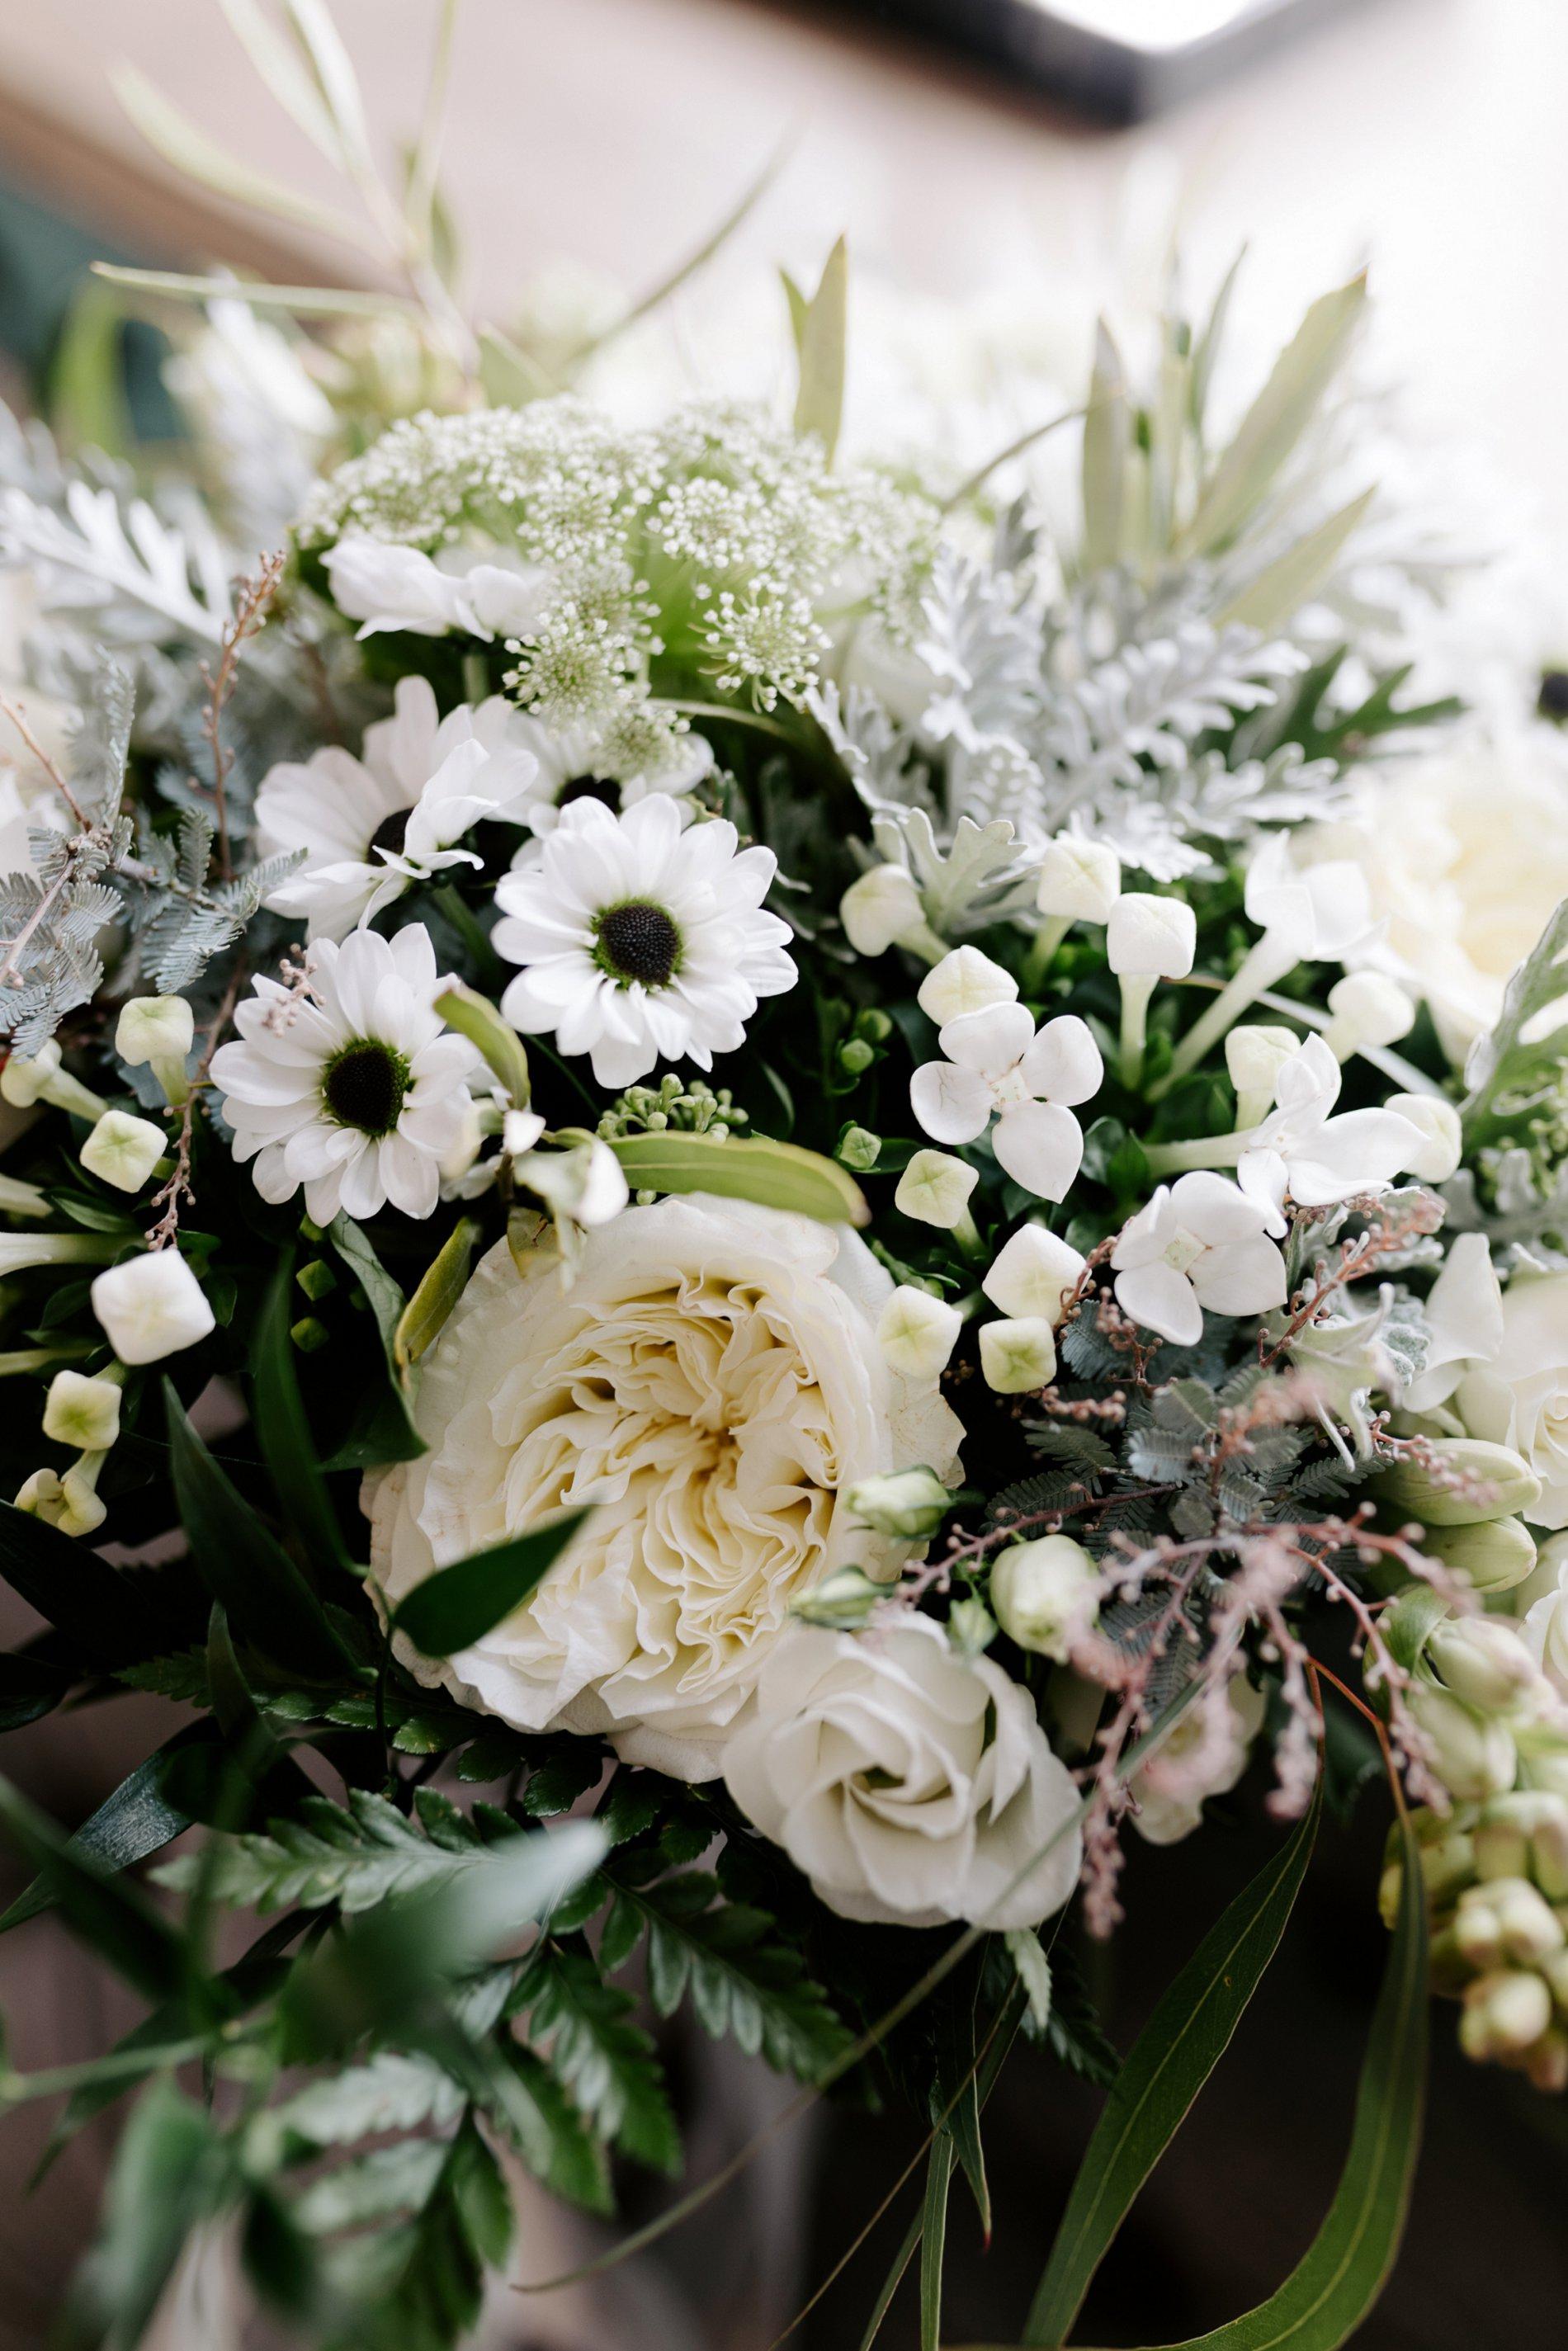 An Elegant White Wedding at Thicket Priory (c) Carla Whittingham Photography (19)